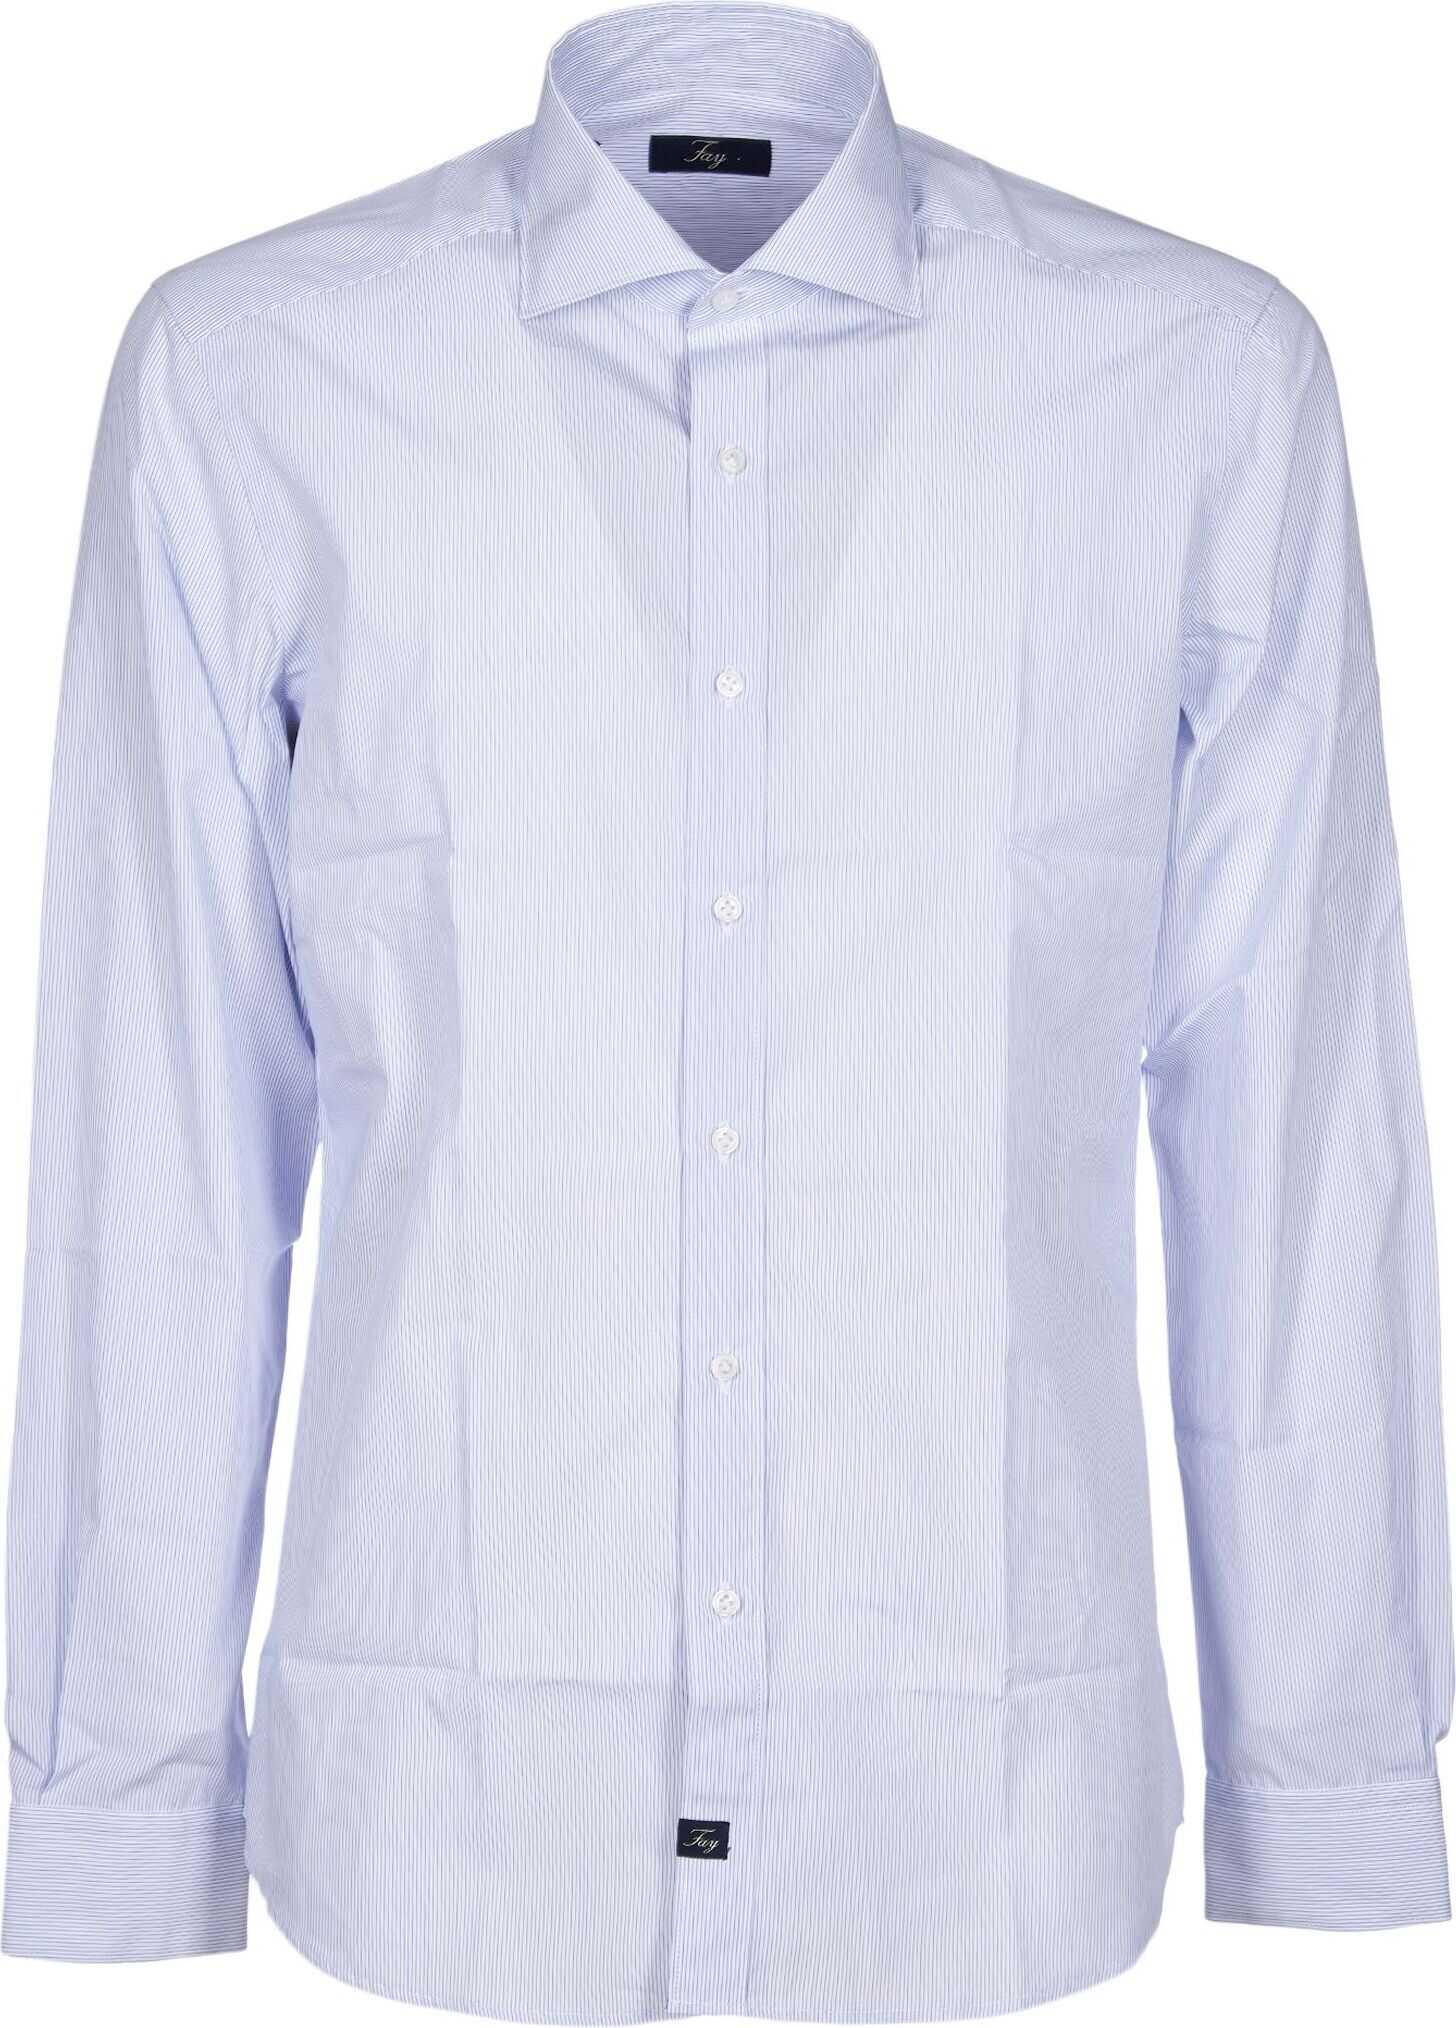 Fay Cotton Shirt LIGHT BLUE